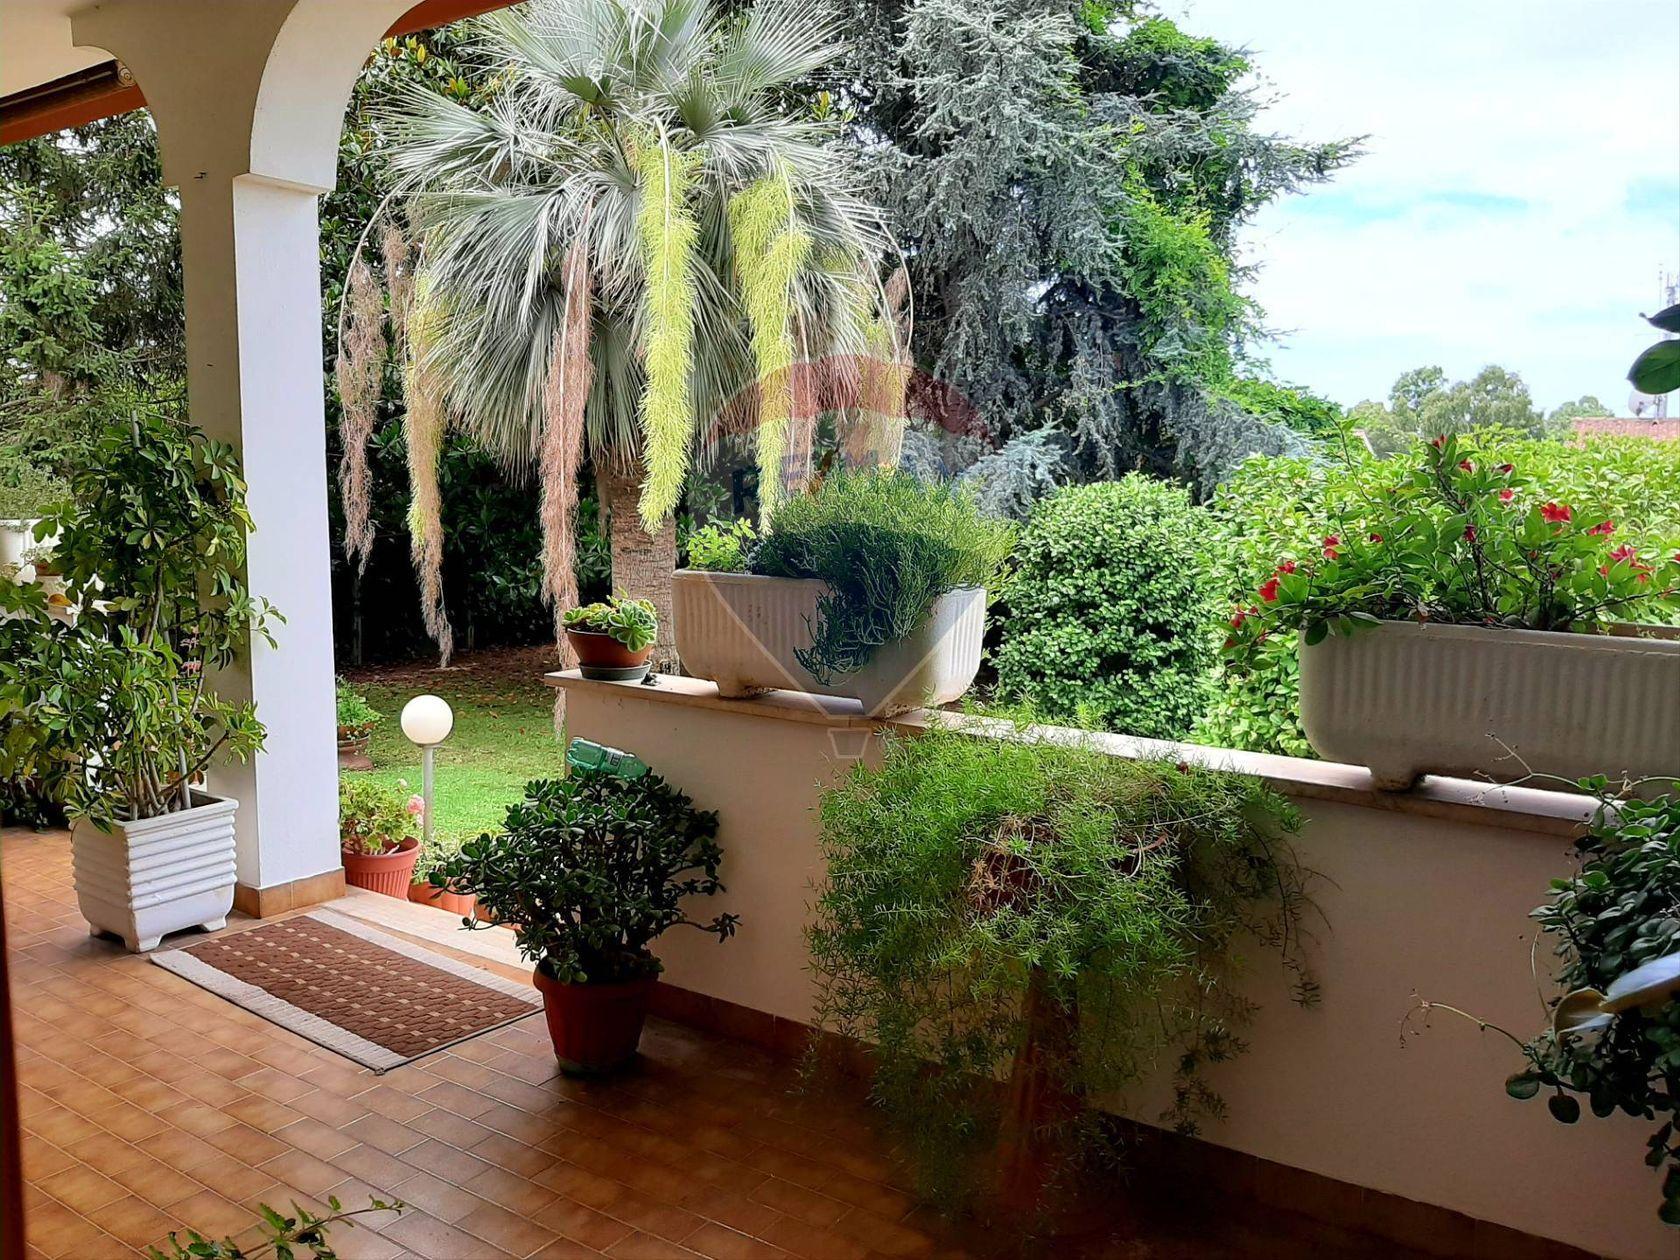 Villa singola Ardea - Nuova Florida, Ardea, RM Vendita - Foto 2